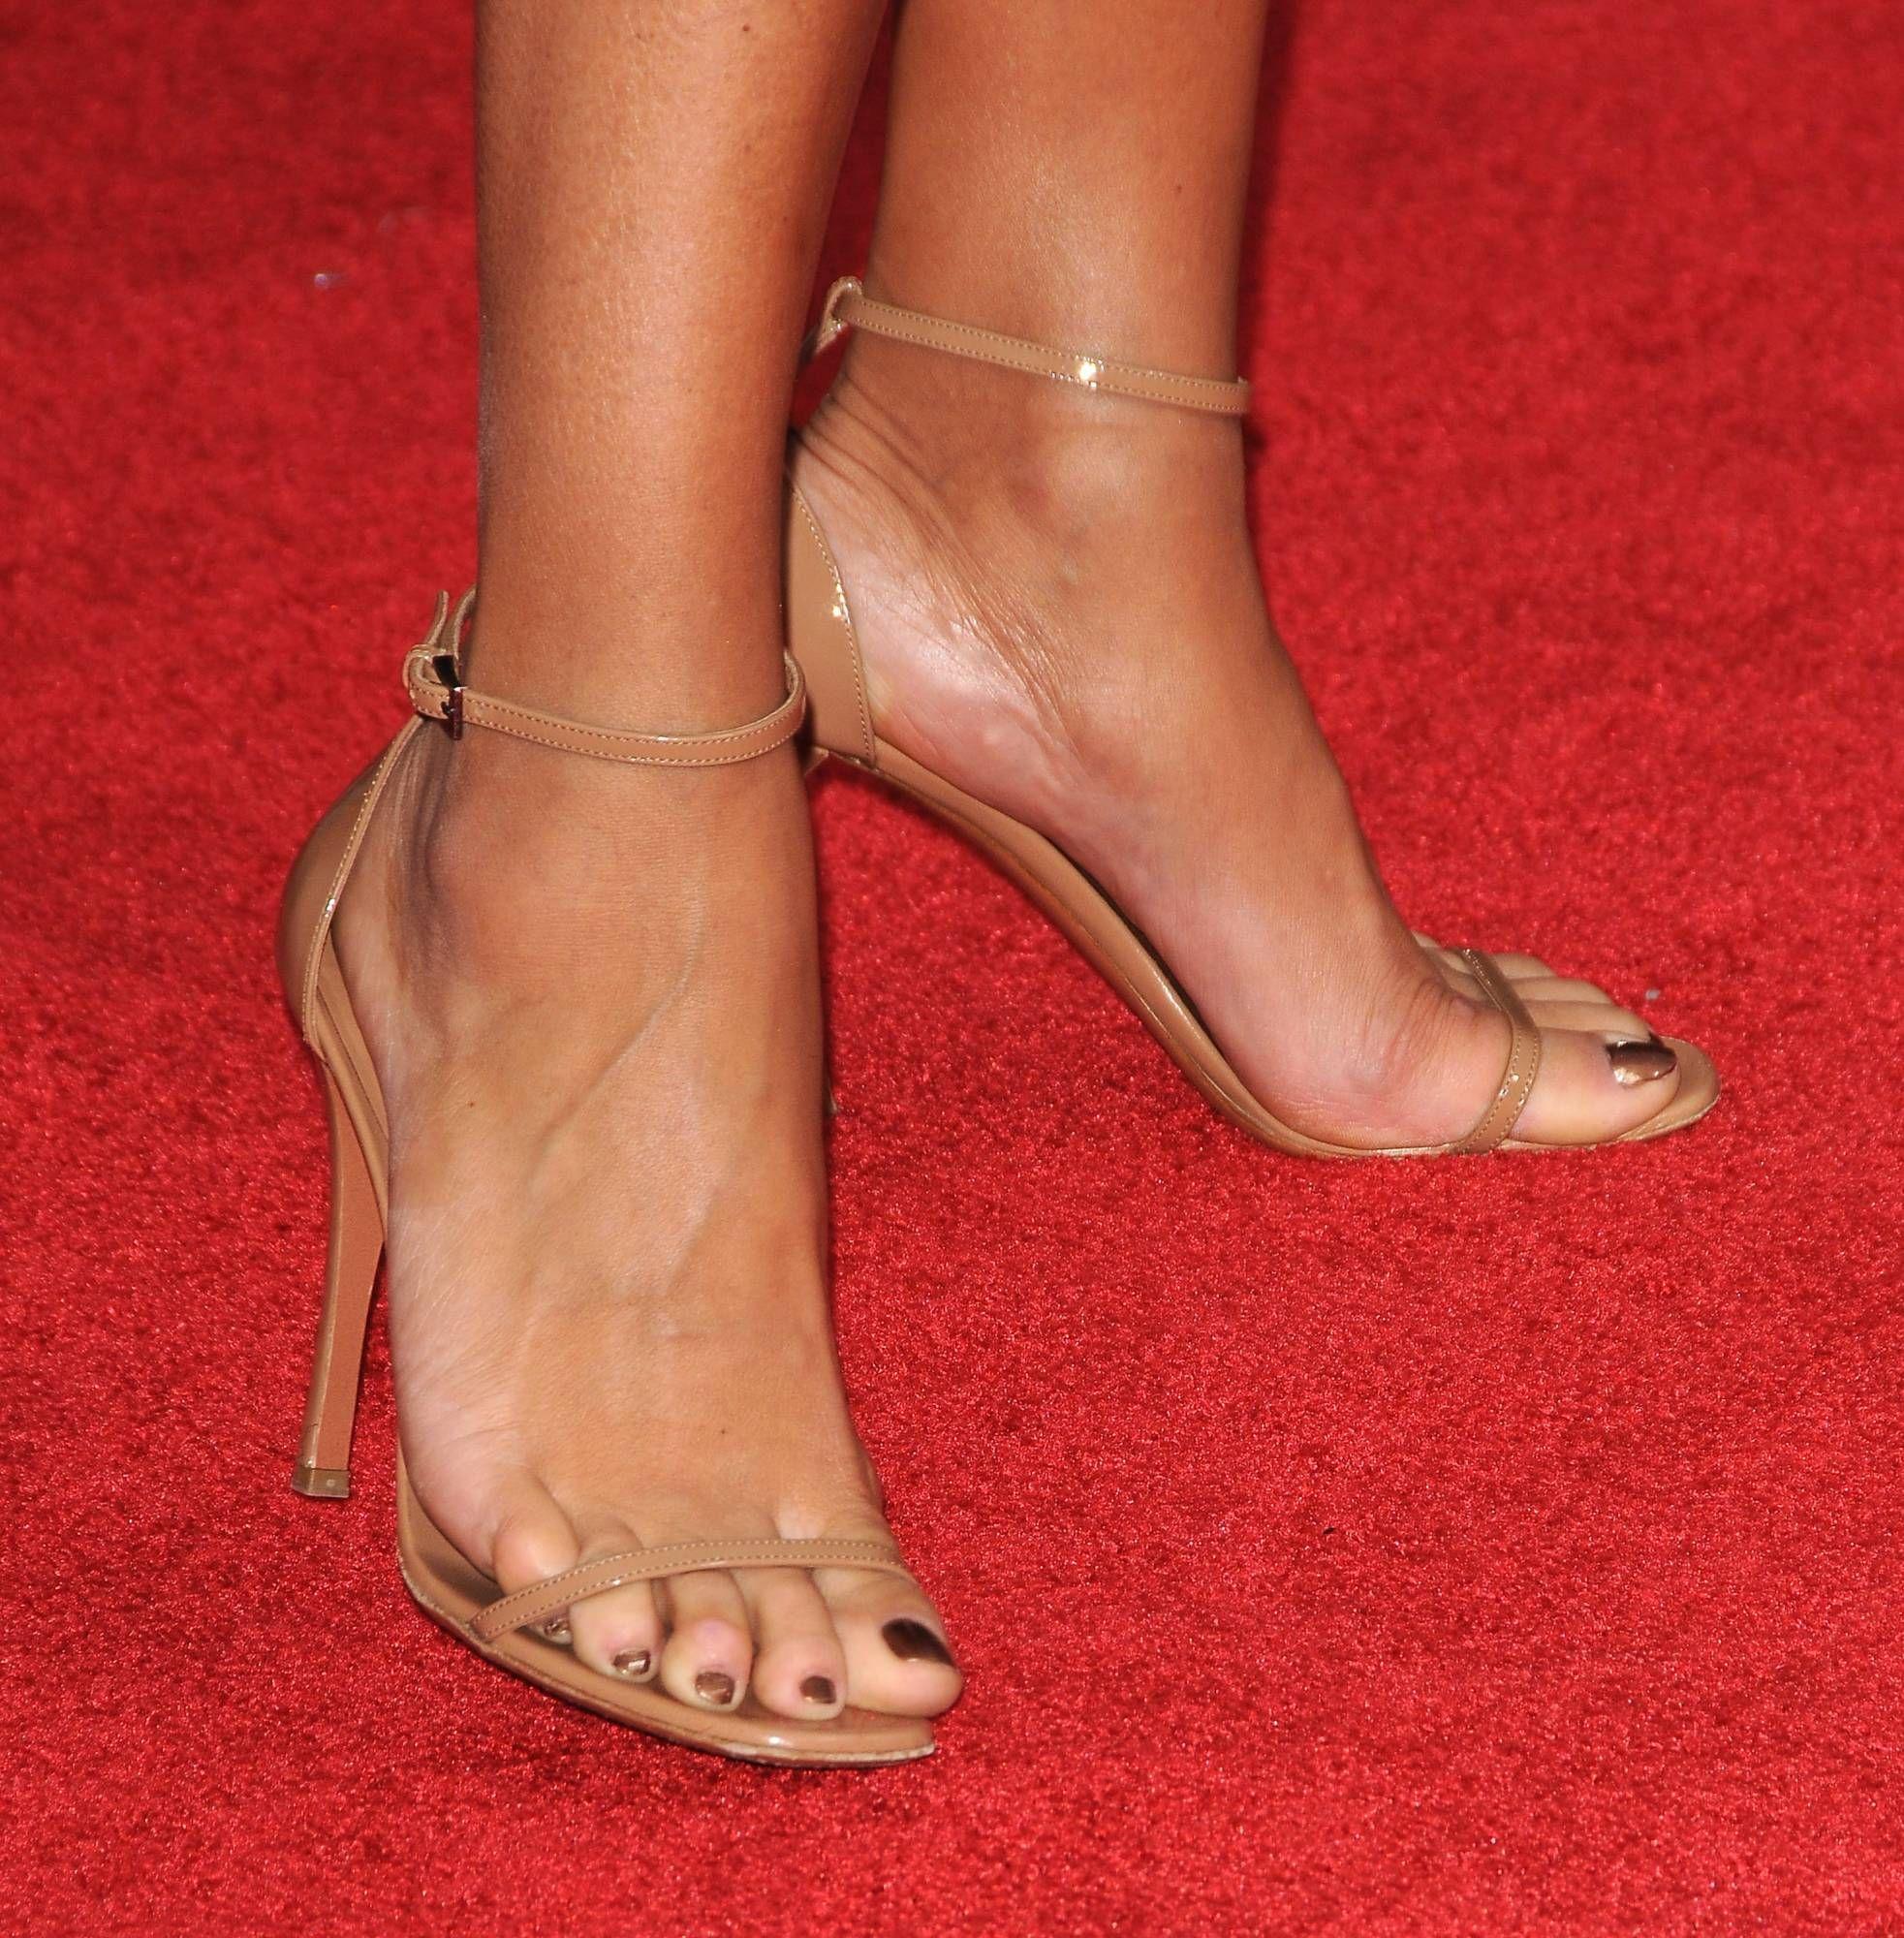 Feet Vanessa Williams nude (97 photos), Sexy, Fappening, Boobs, braless 2020